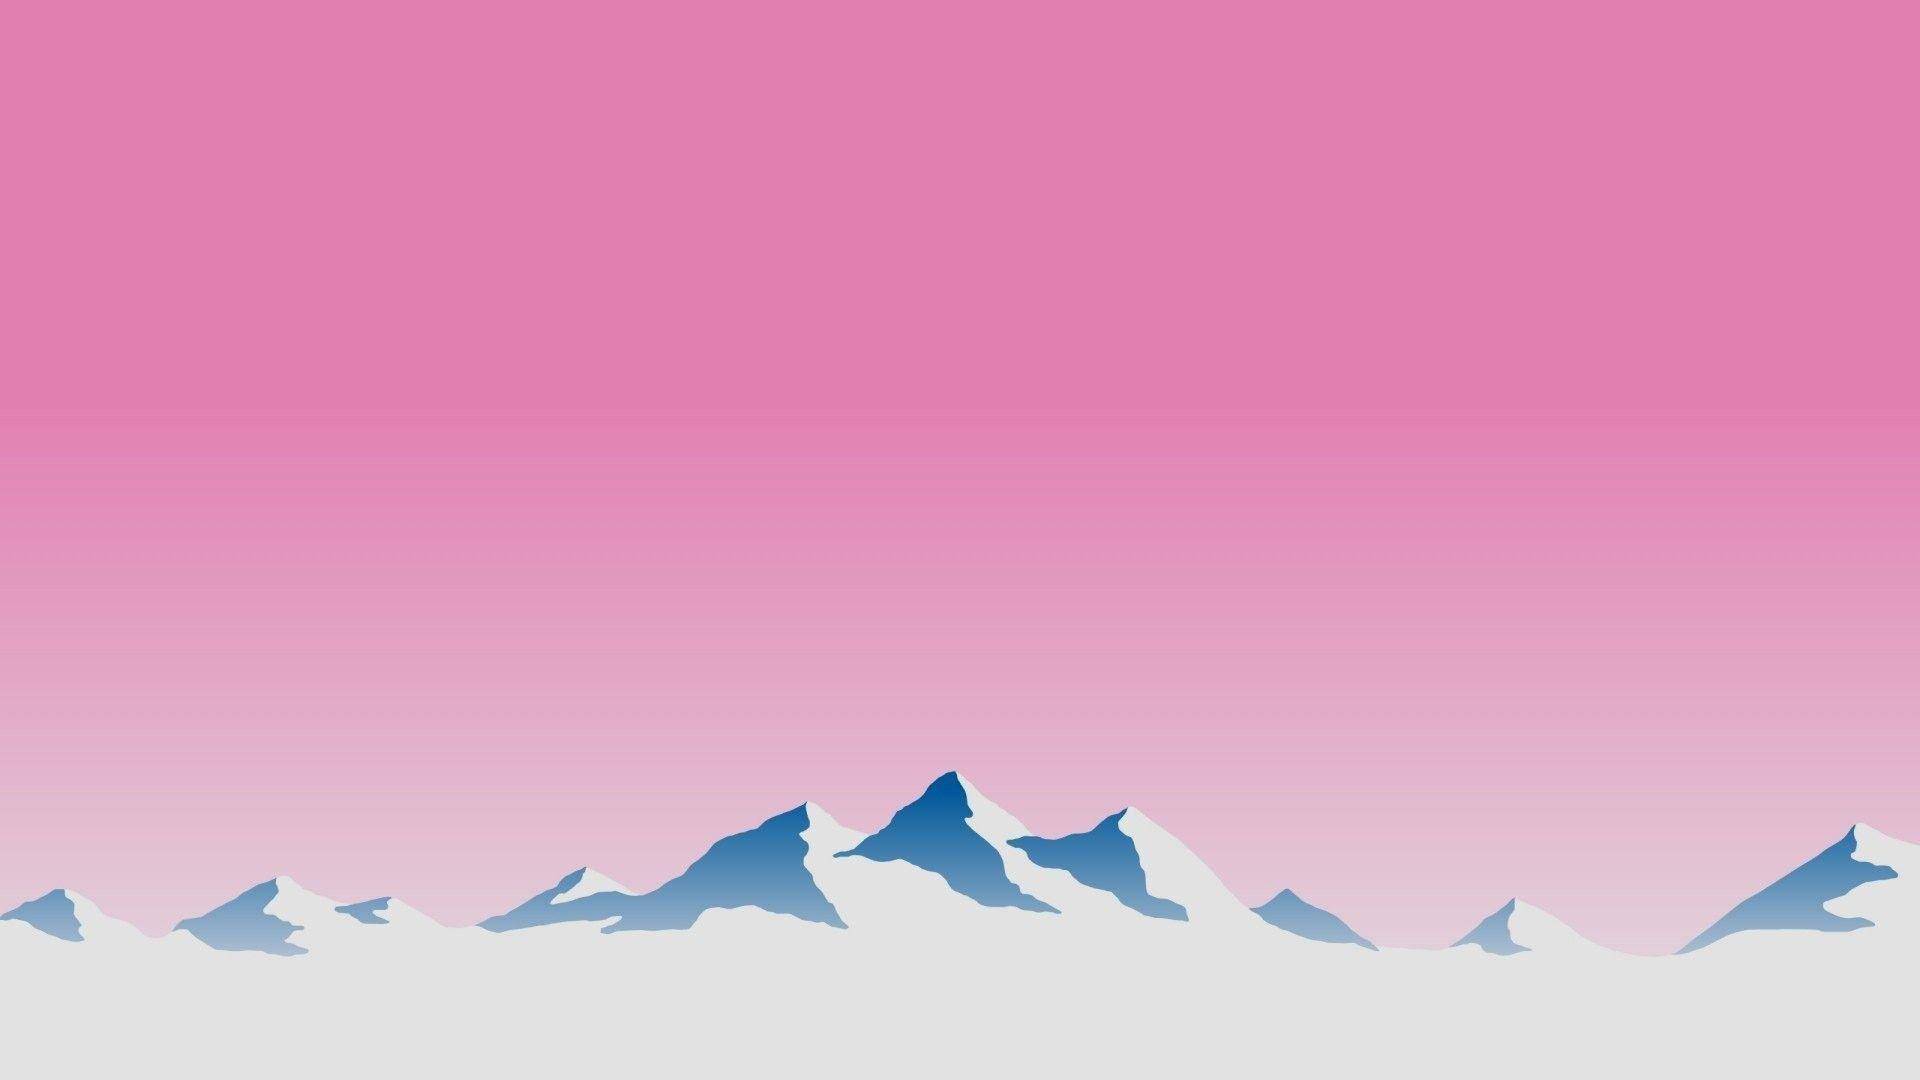 Full Size Aesthetic Tumblr Backgrounds 1920x1080 Aesthetic Tumblr Backgrounds Pink Wallpaper Computer Pink Wallpaper